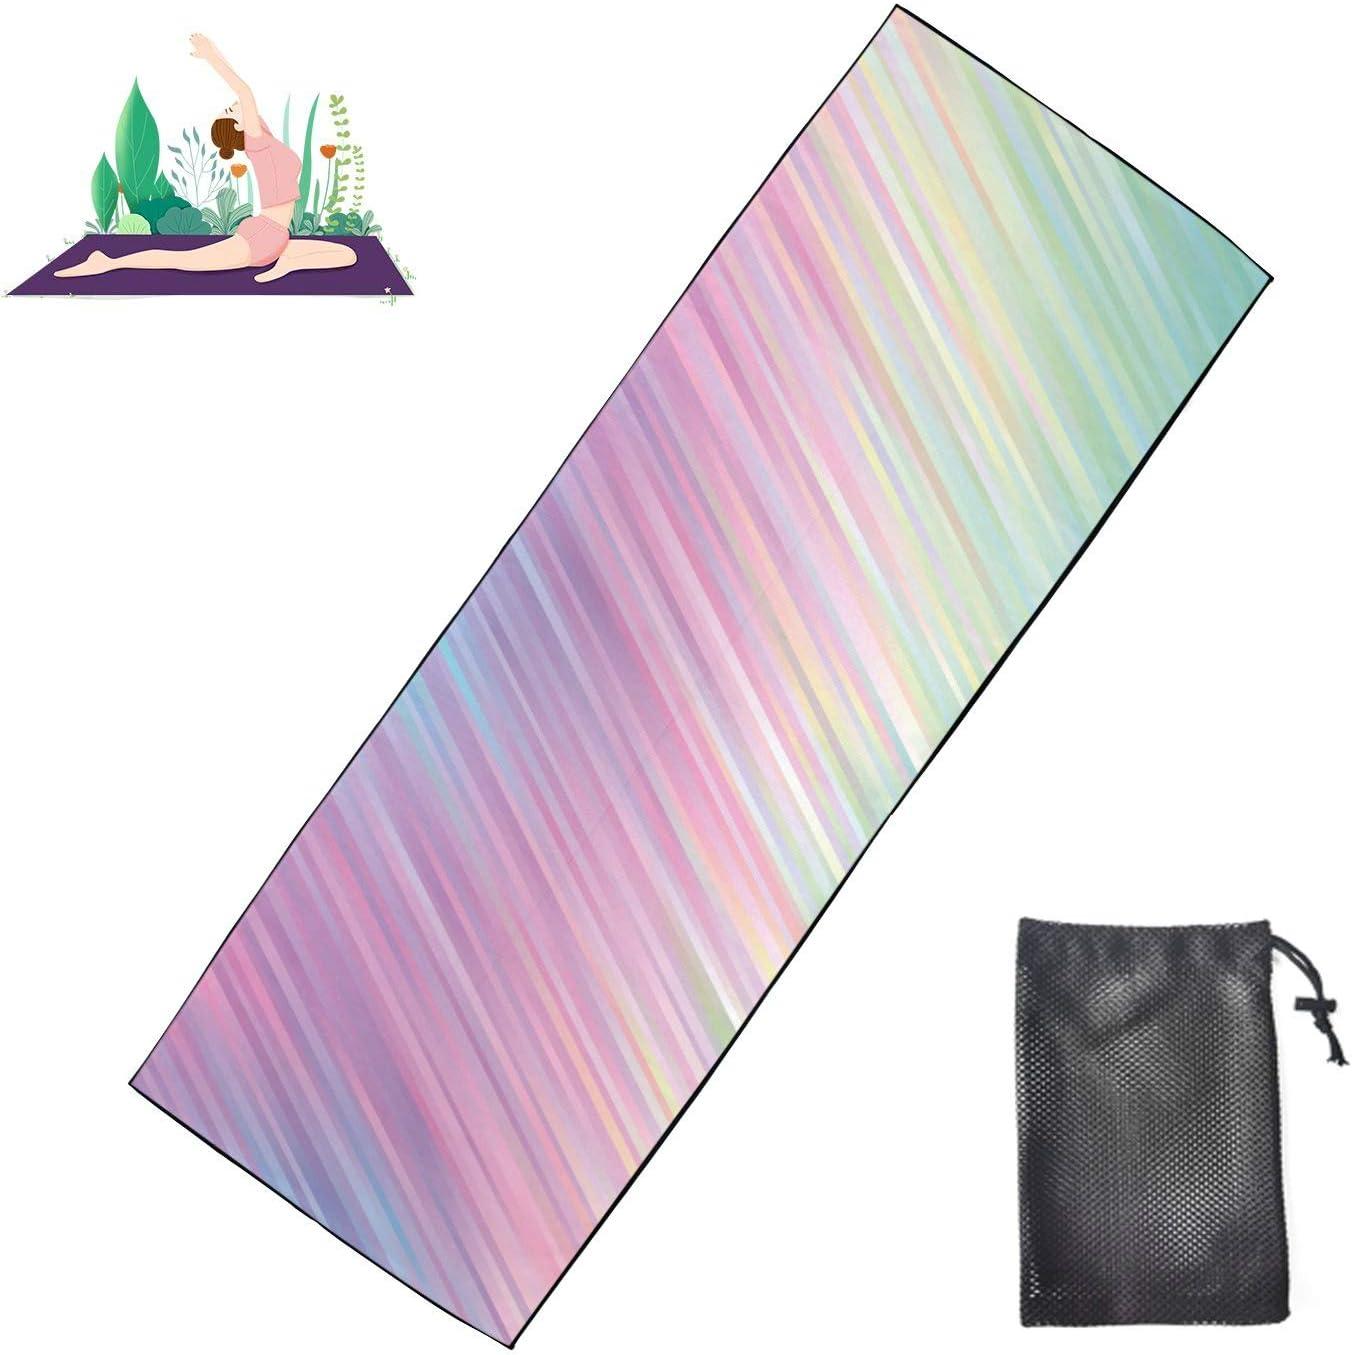 Jnseff Non-Slip Yoga Towel safety Holographic New item Vector Stripes Gradient P